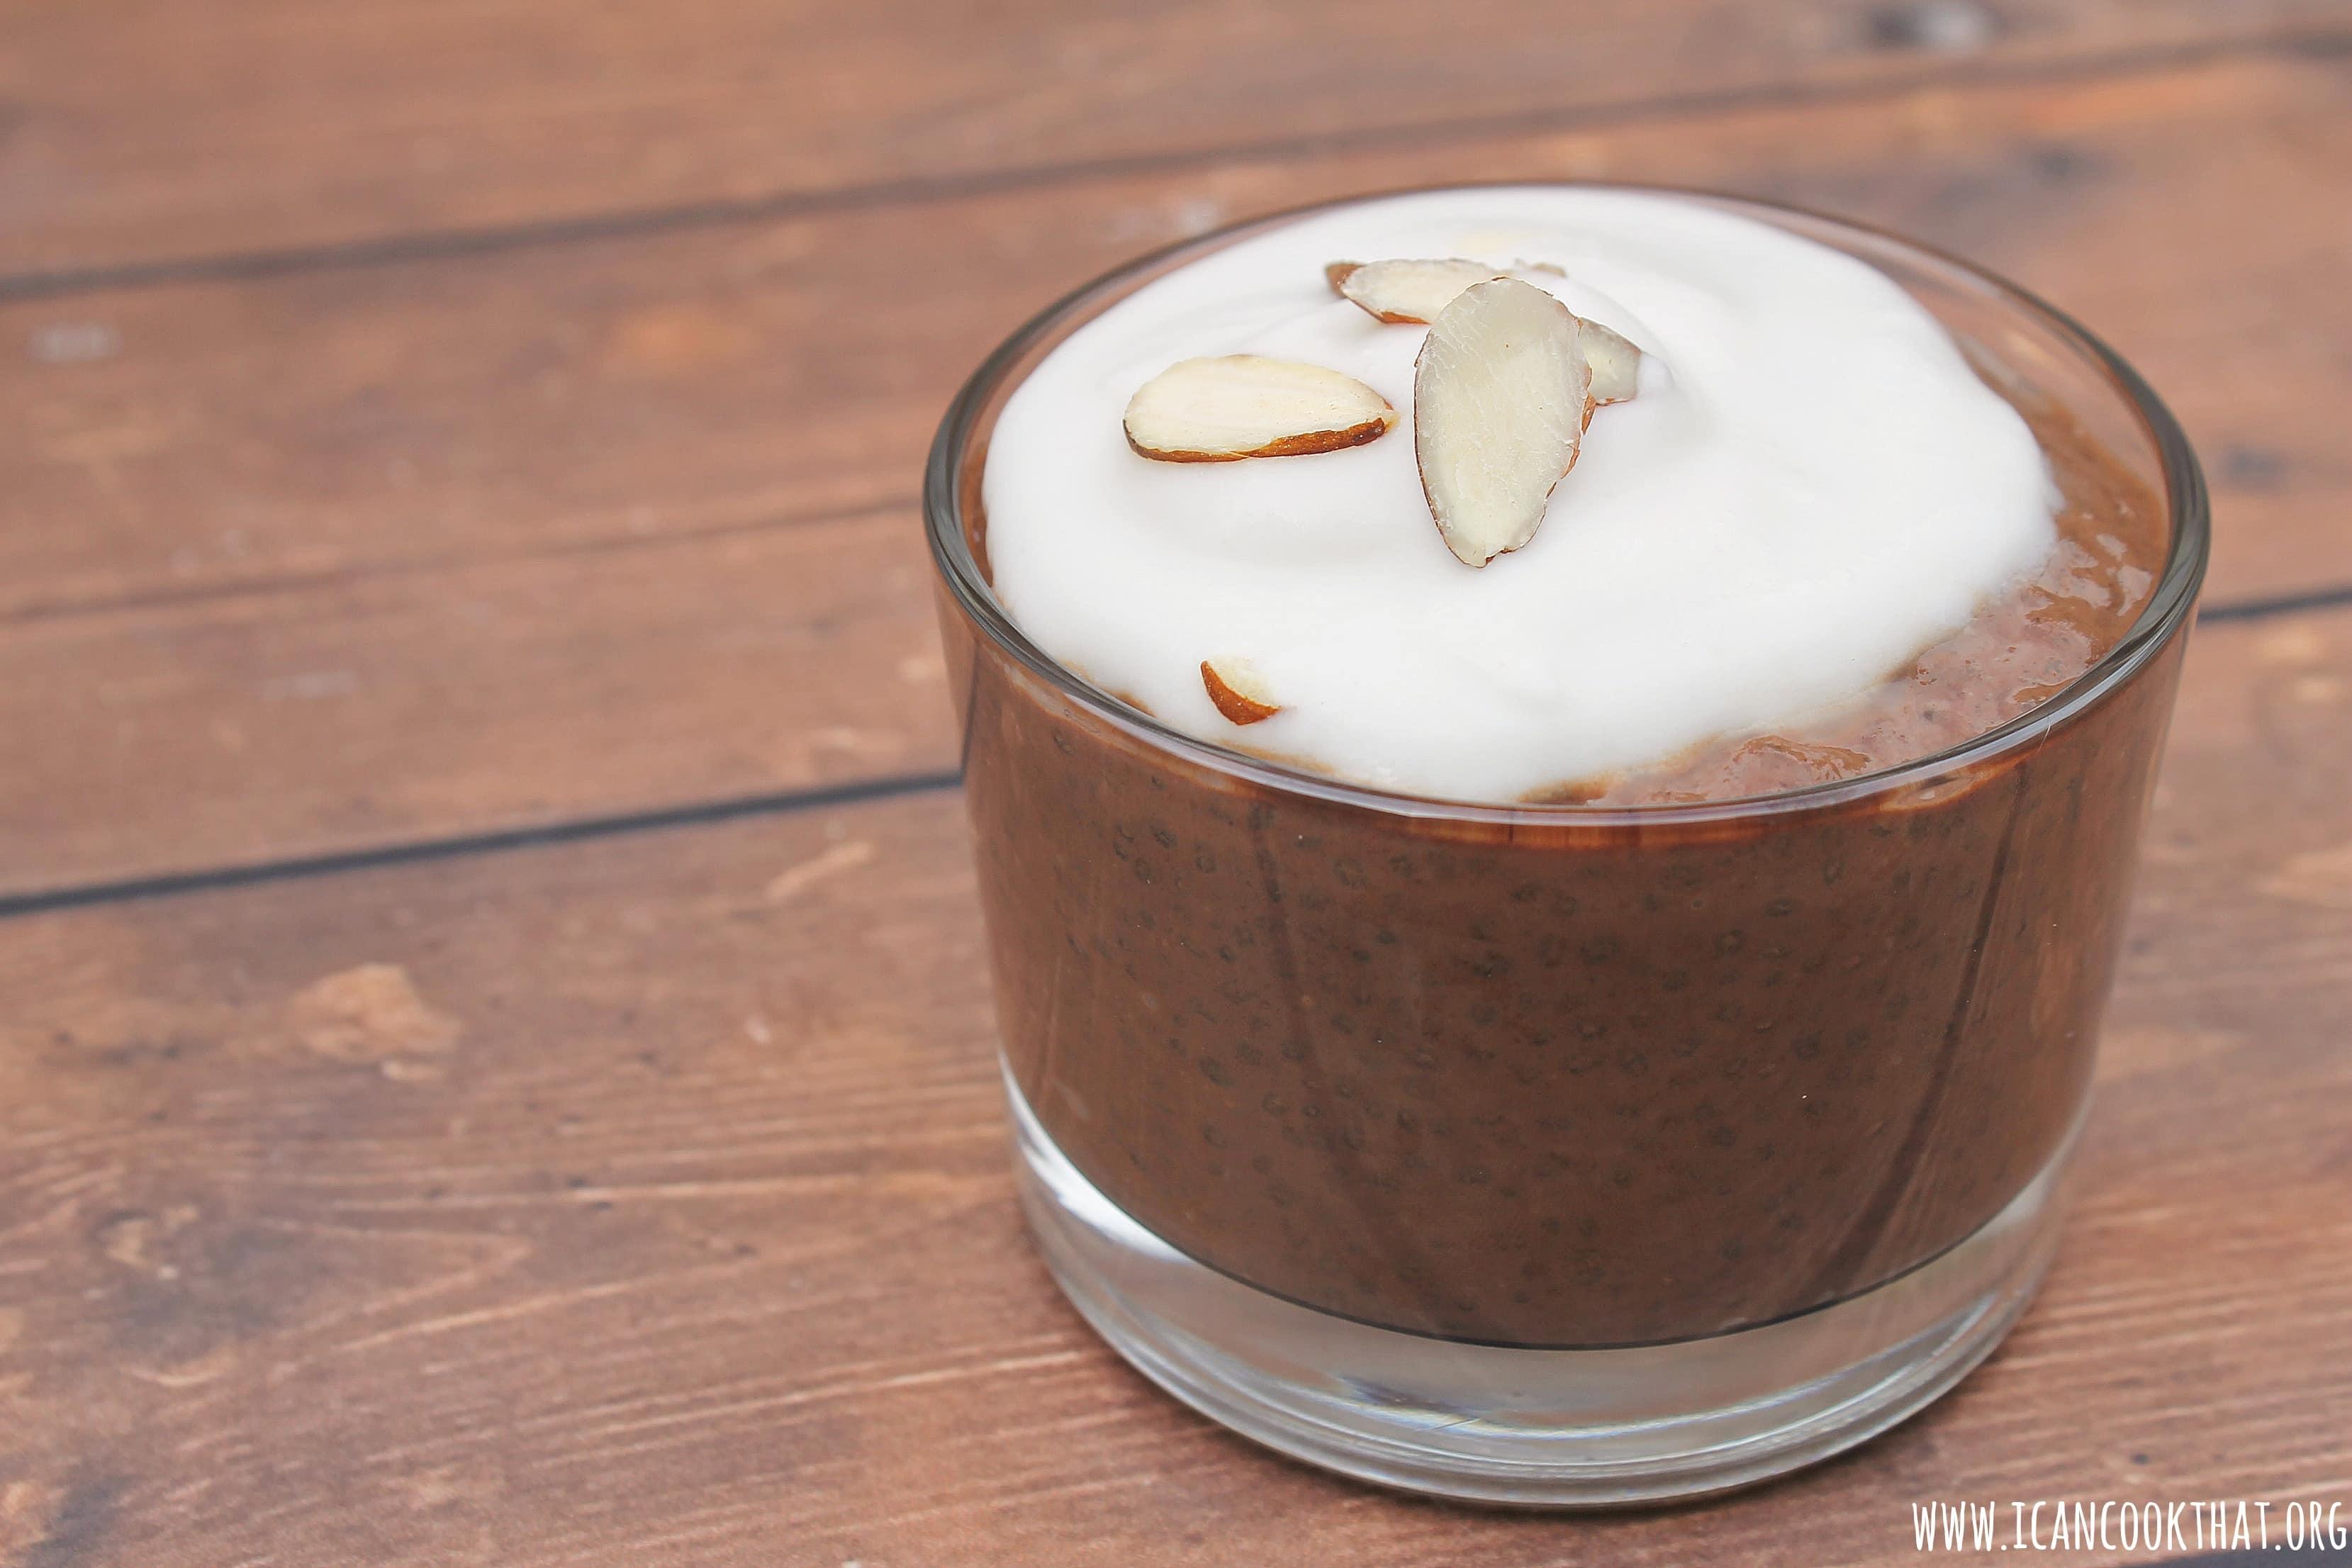 Overnight Chocolate Chia Pudding